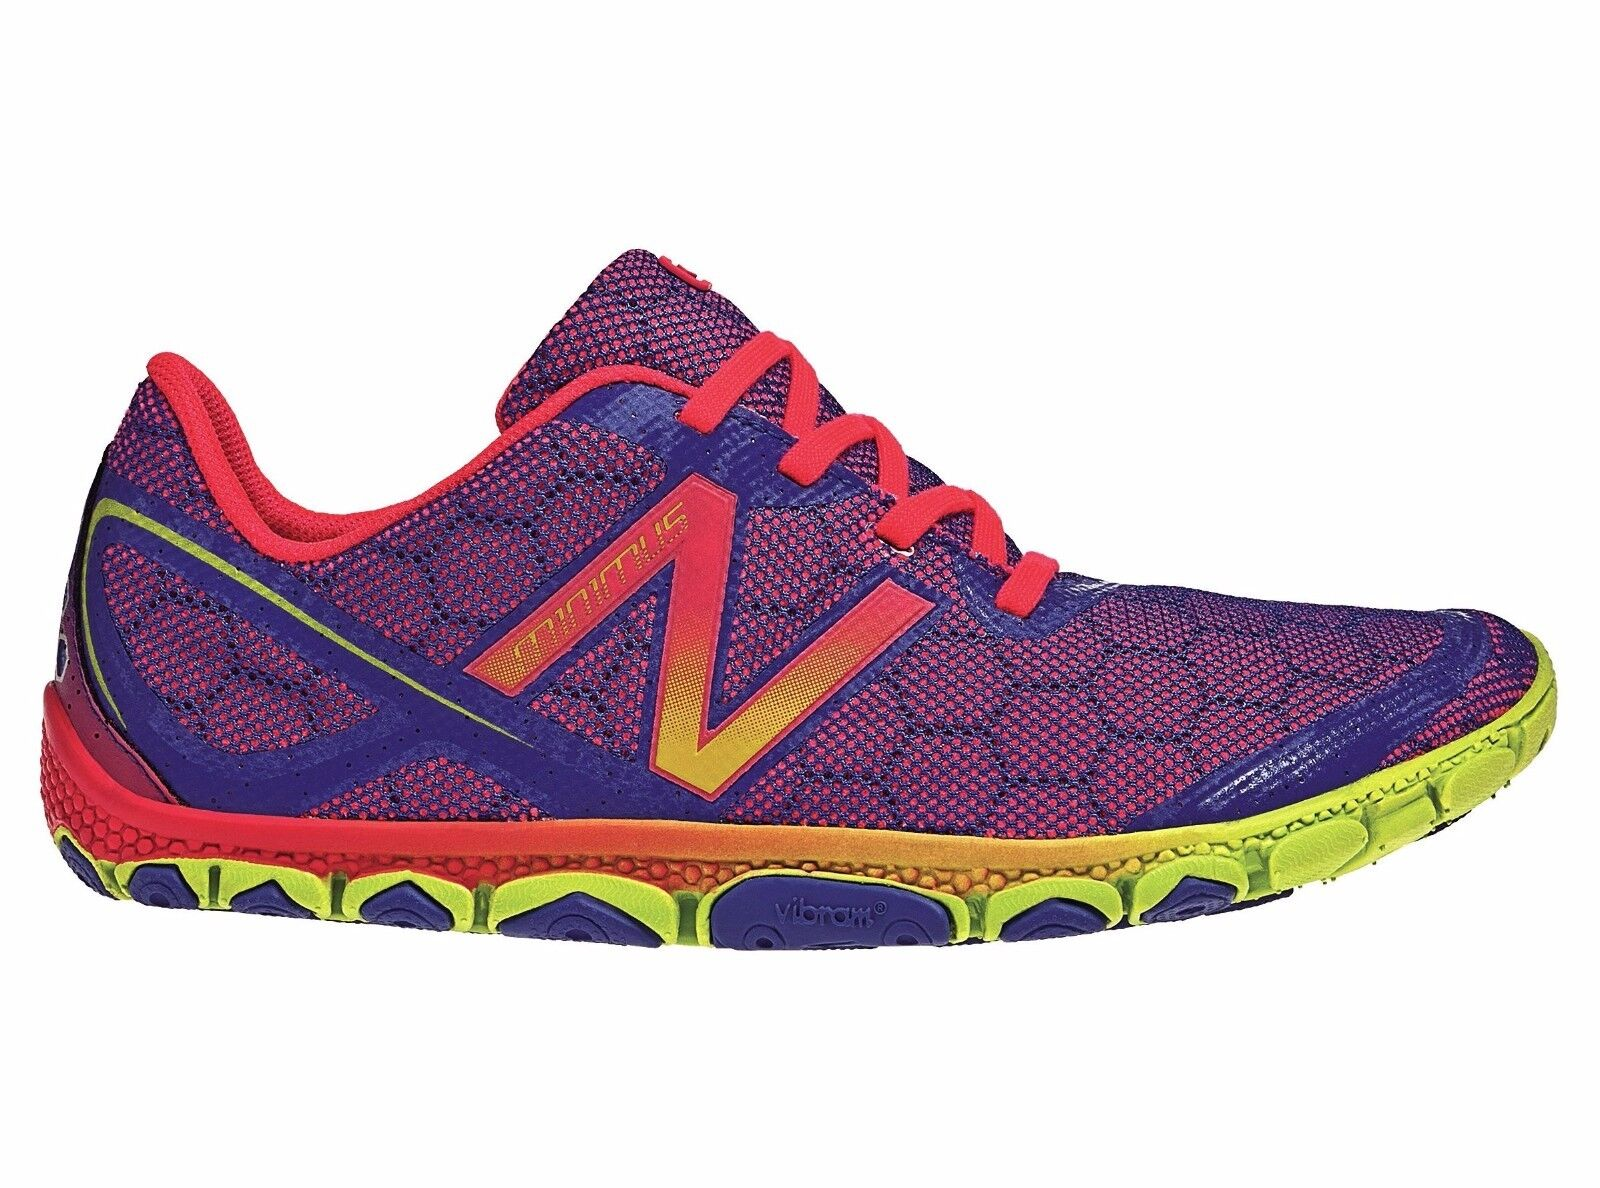 New Balance Minimus WR10 WR10 WR10 BP2 WR10BP2 Running scarpe Donna  4957d0